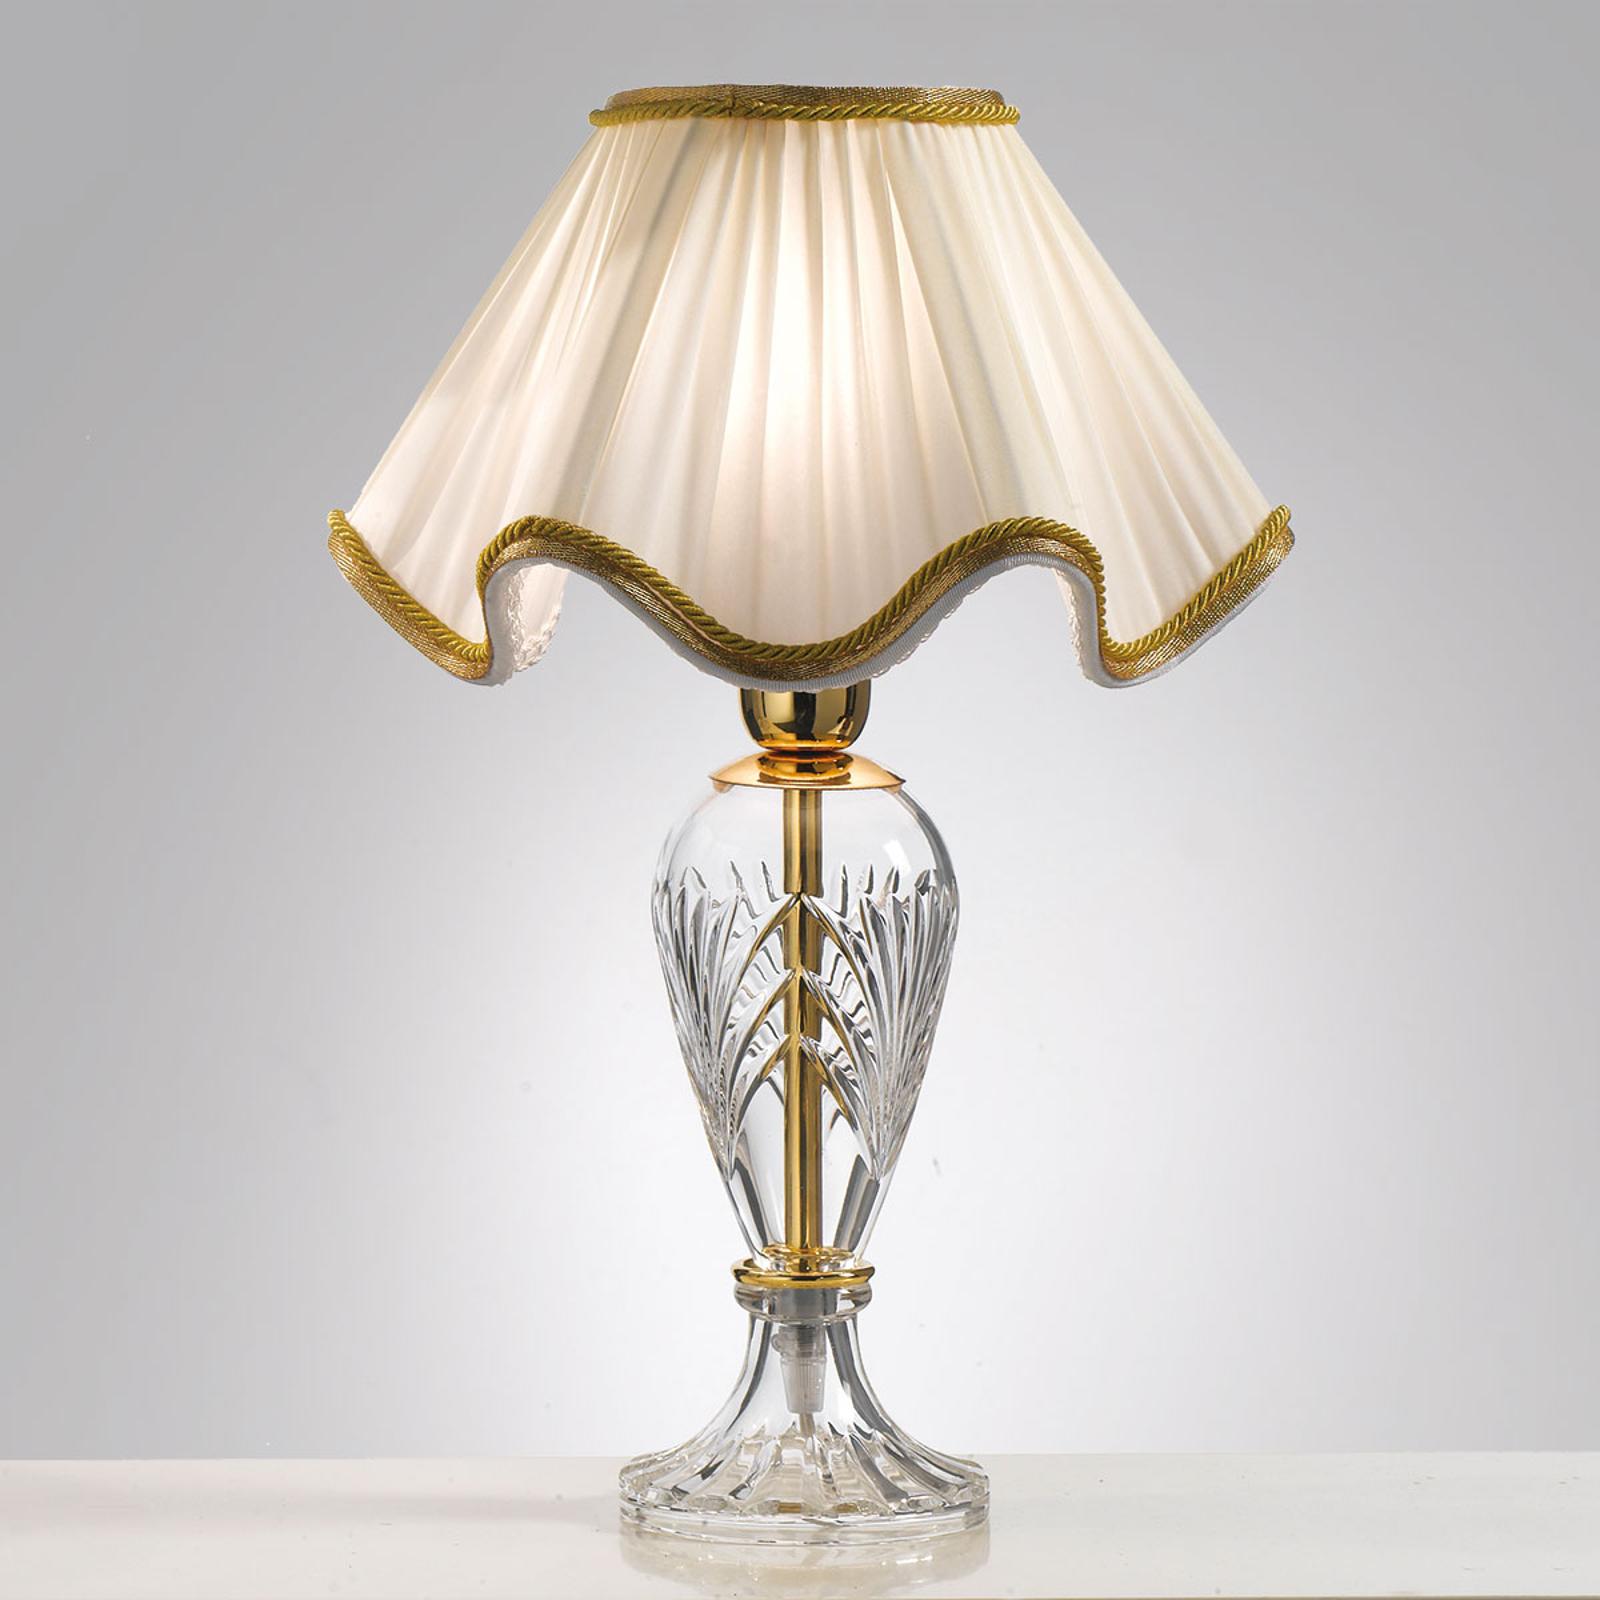 Smuk Belle Epoque bordlampe, 48 cm